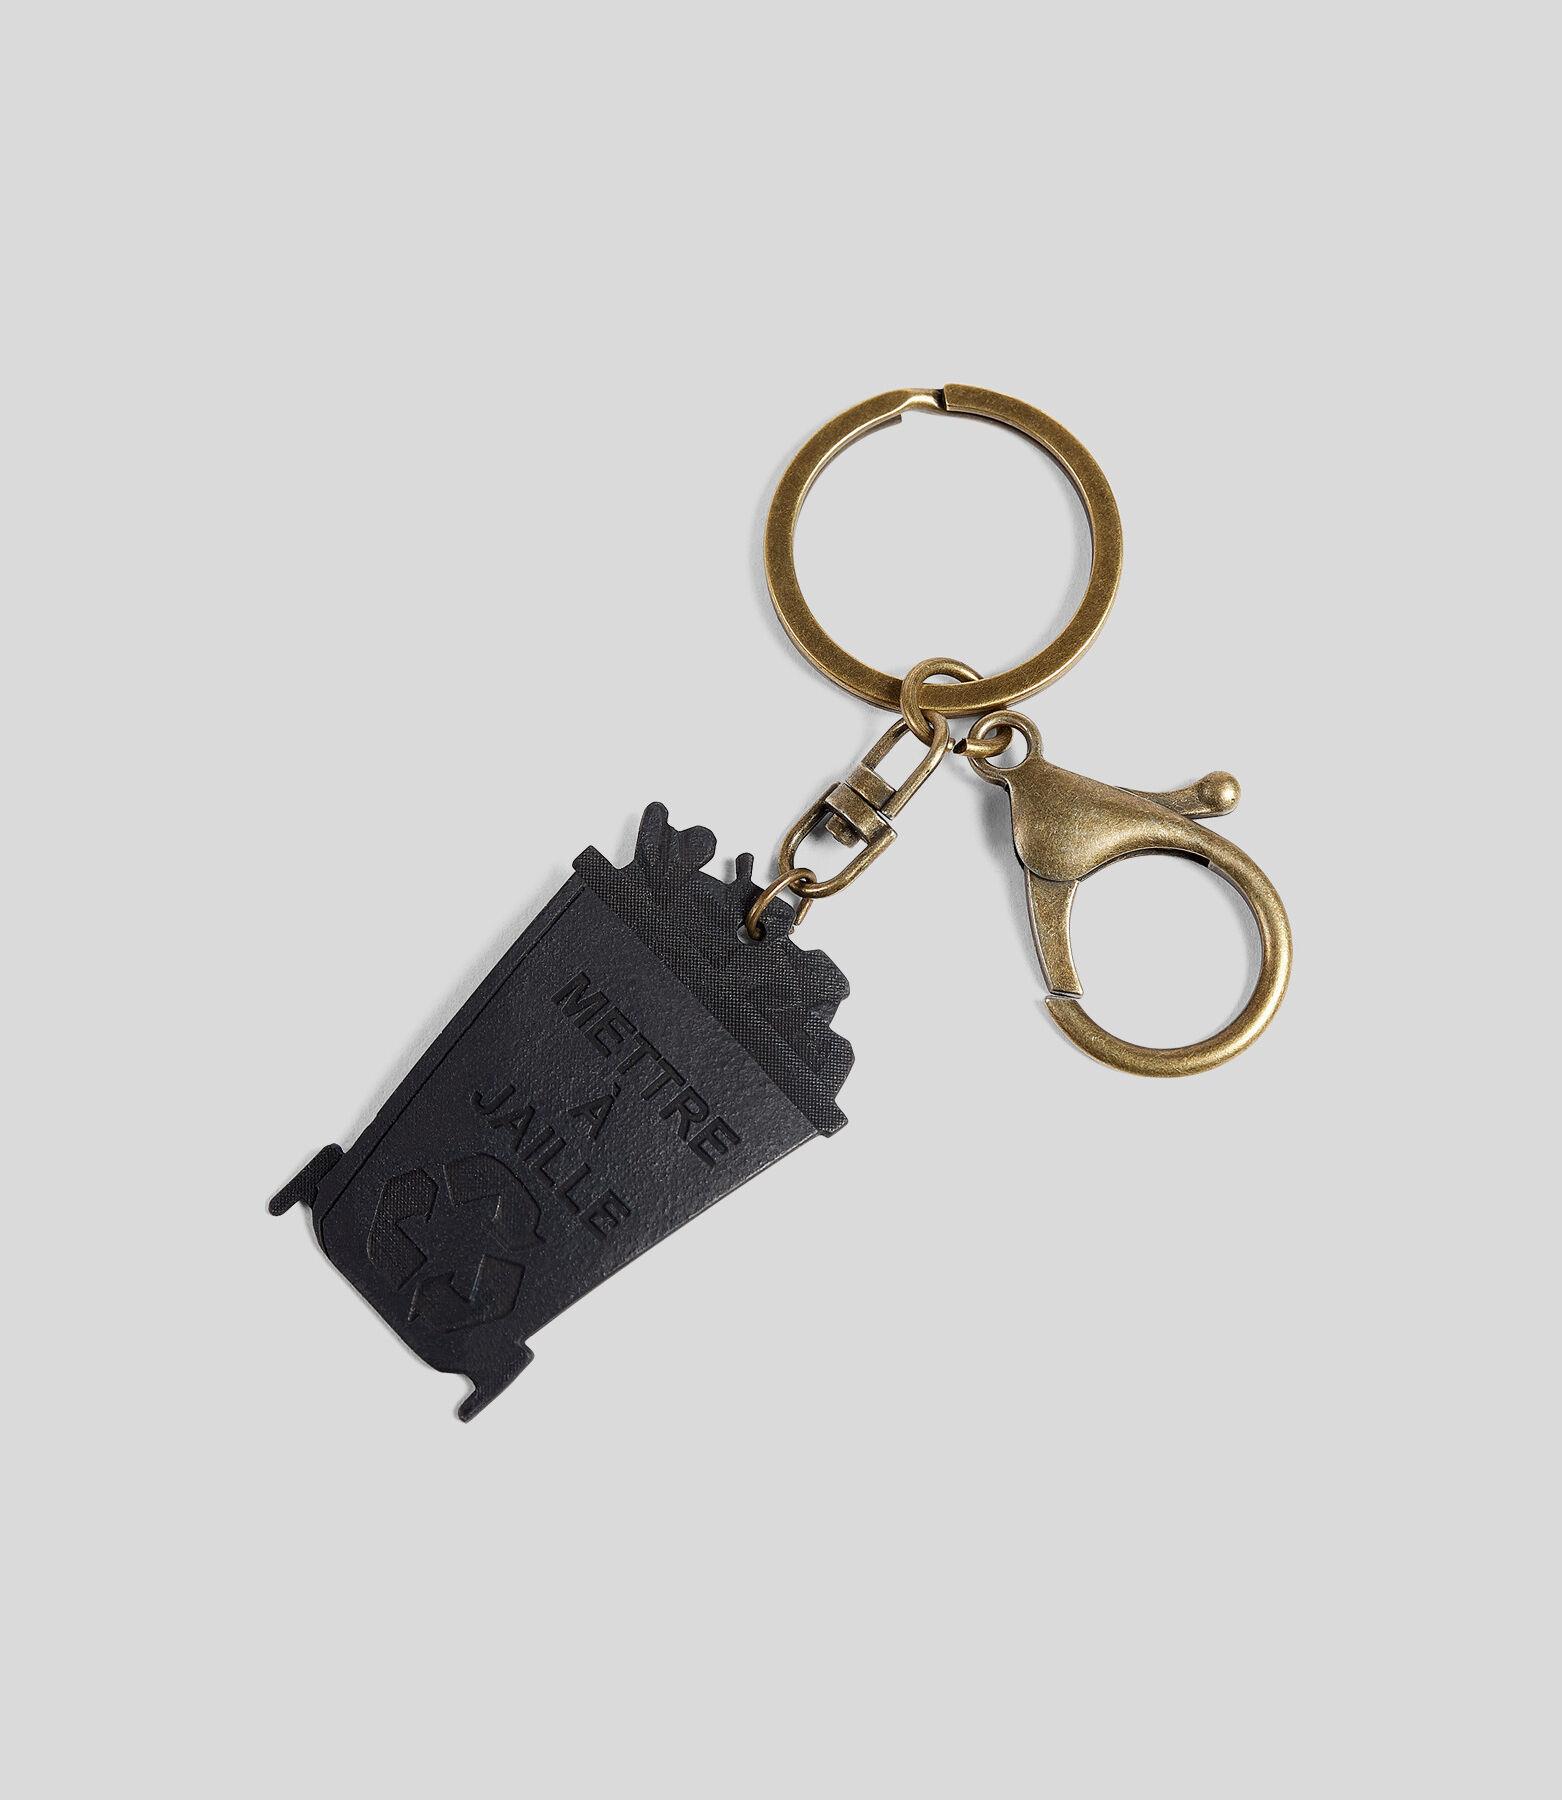 Porte clef Kerozen74